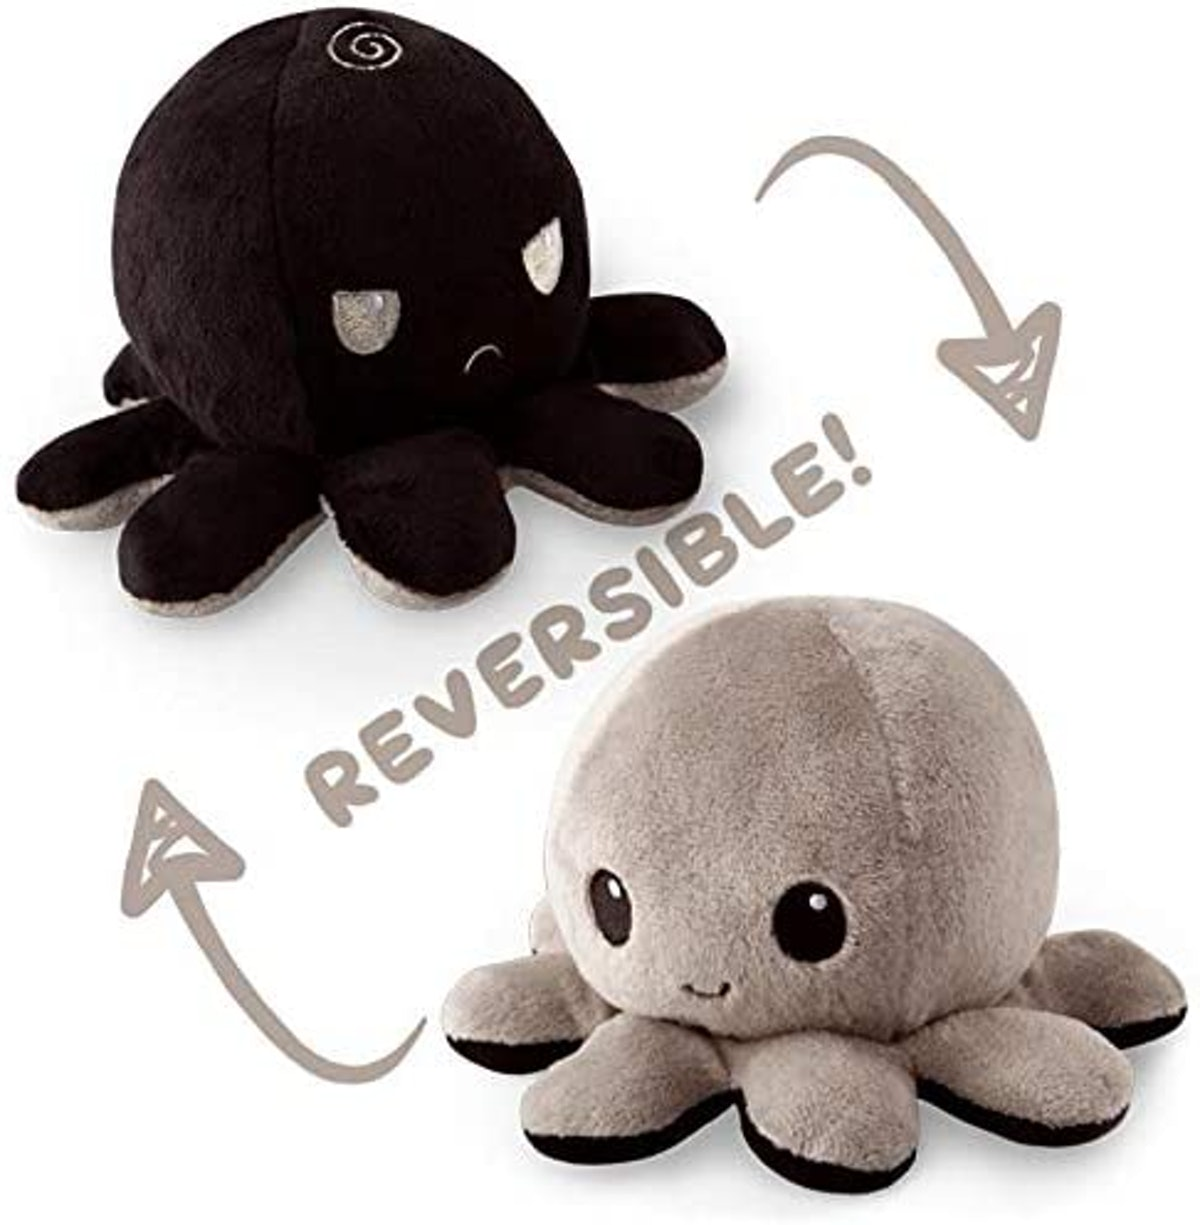 The Original Reversible Octopus Plushie